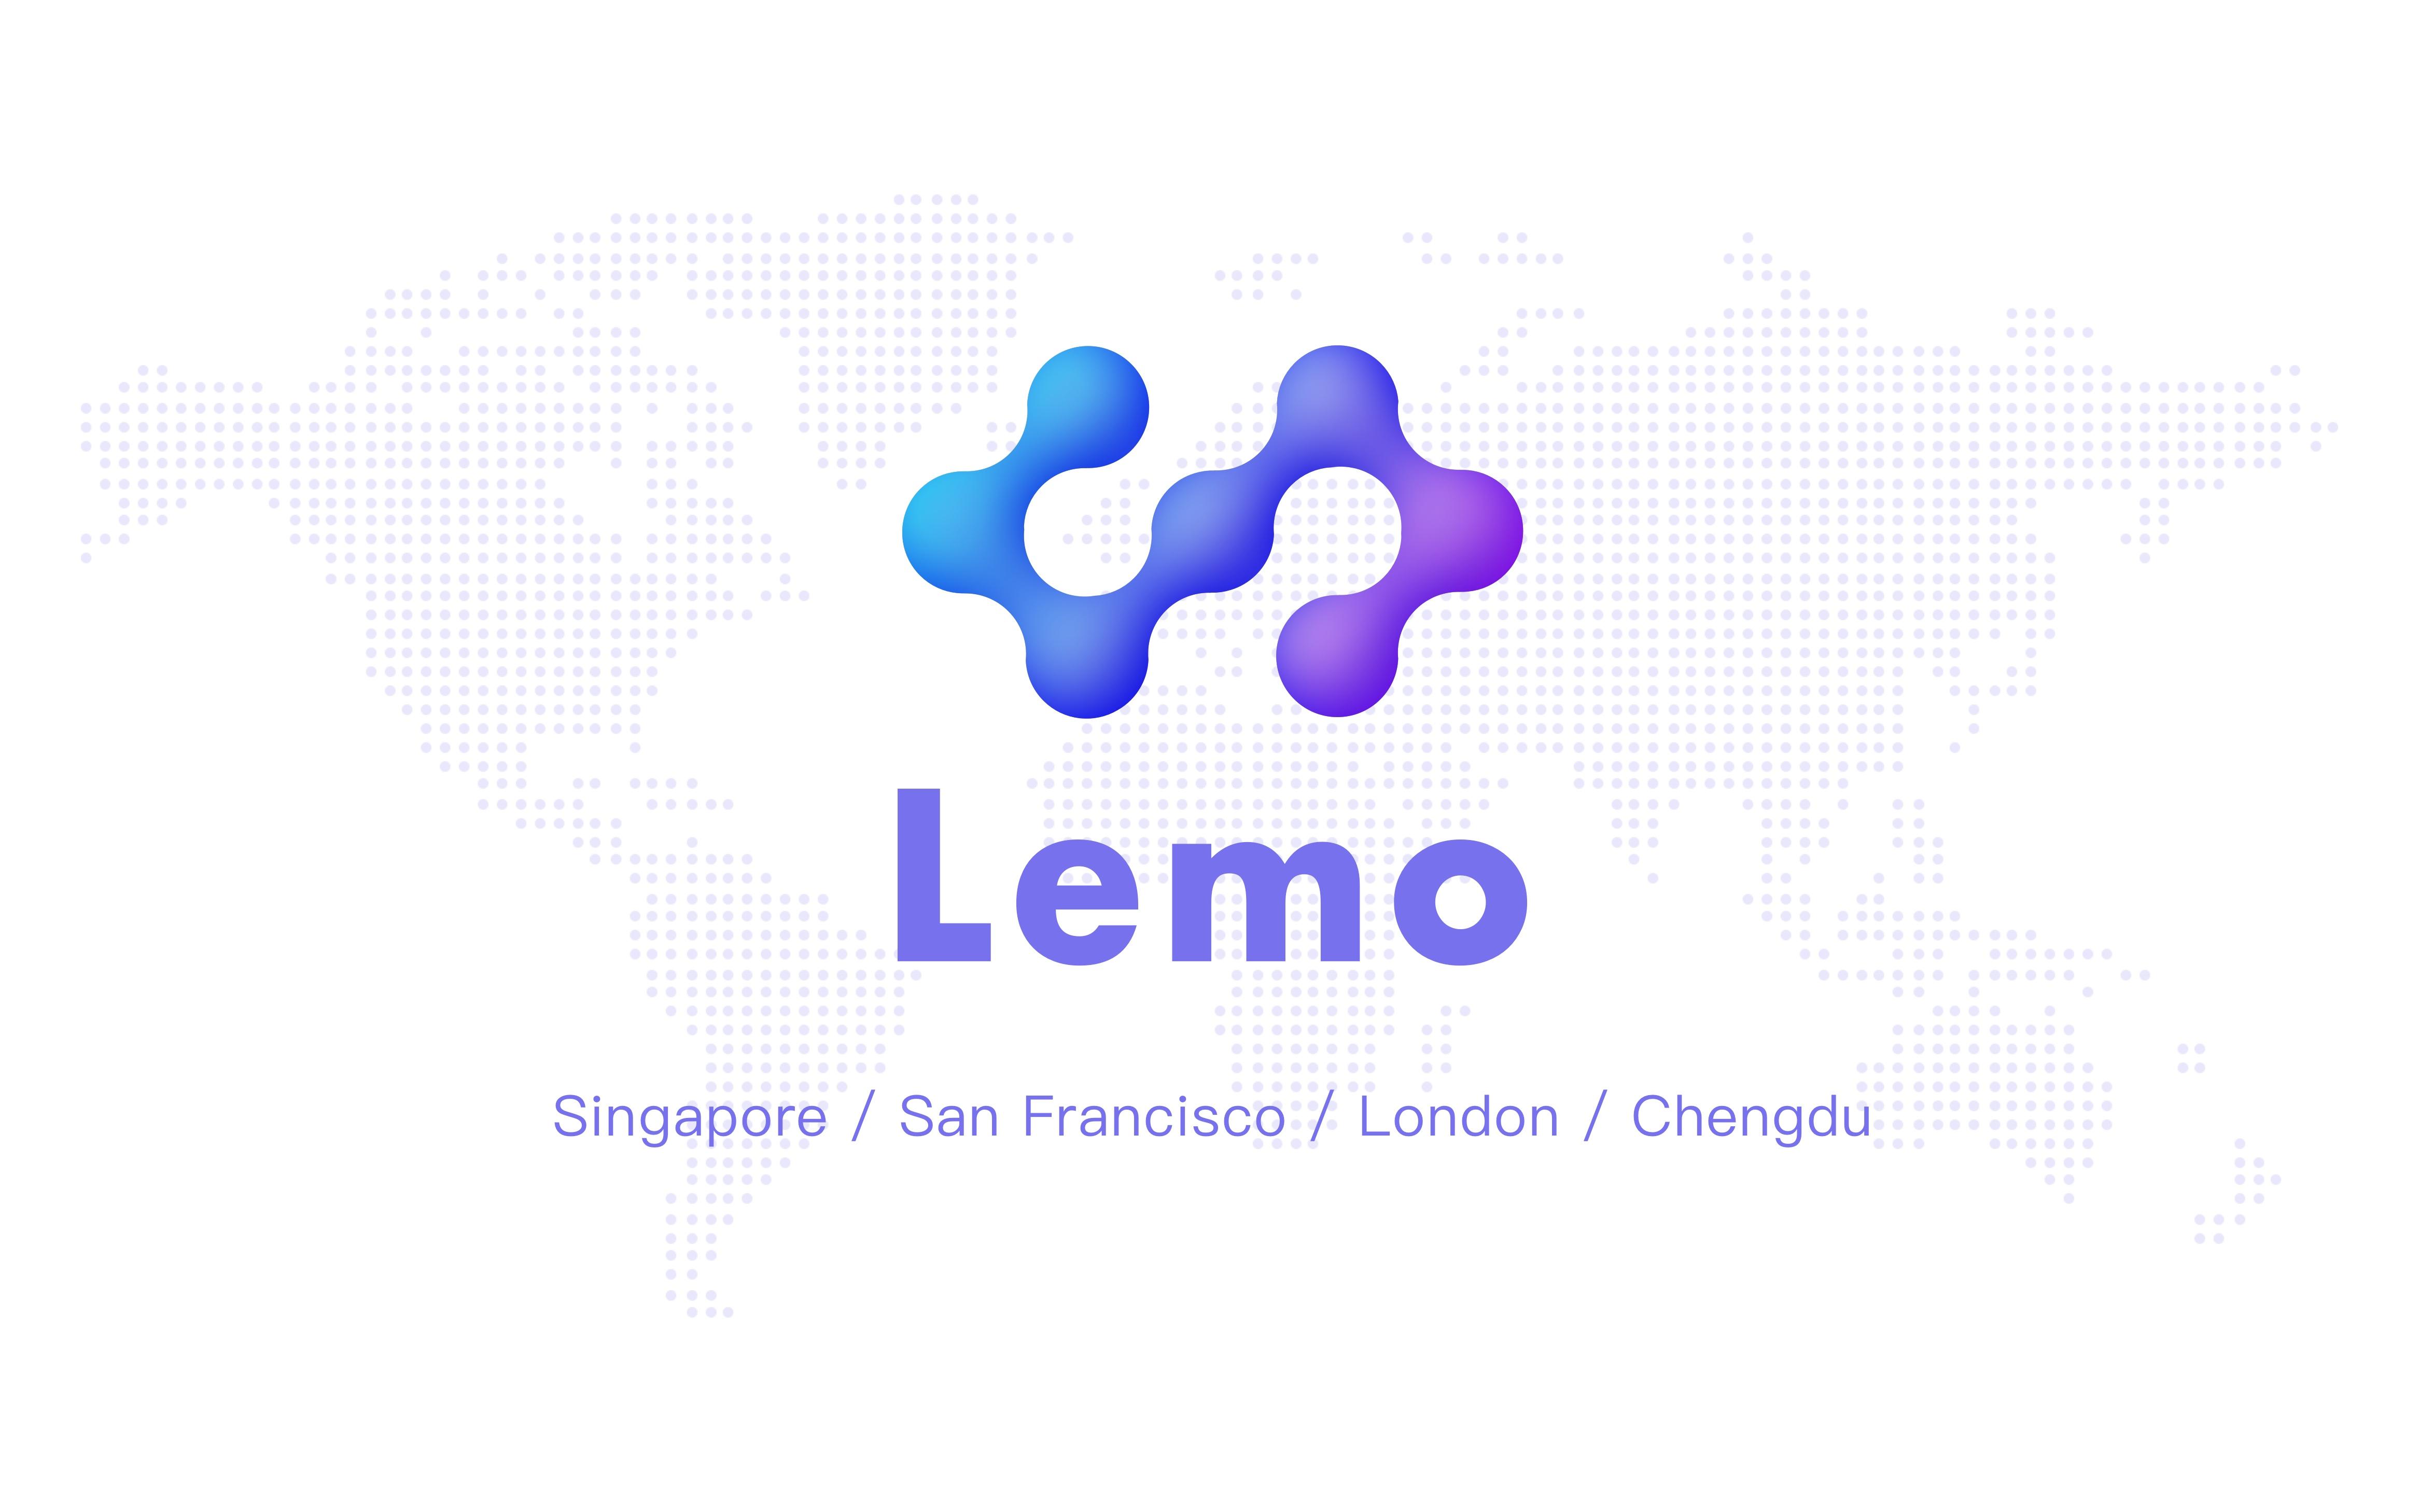 LemoChain CEO马施然:构建B端数据流通的去中心化生态丨链茶访